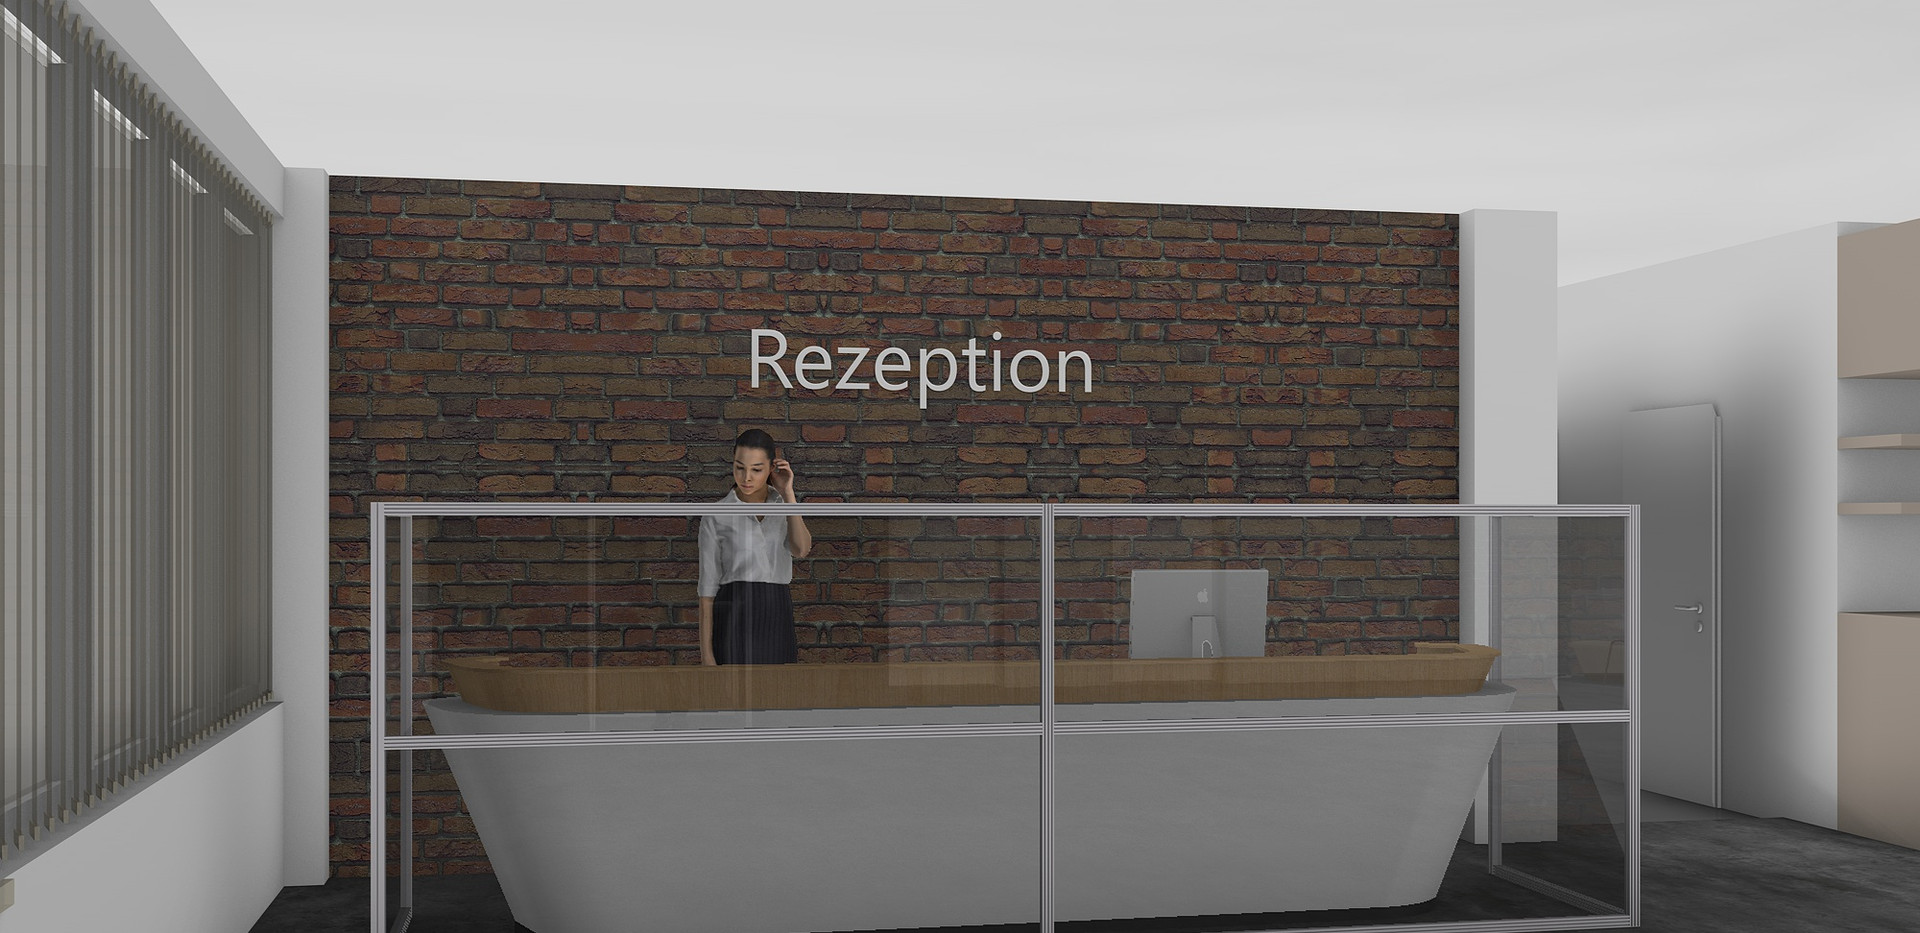 Spuckschutz_Rezeption_V2-001.jpg